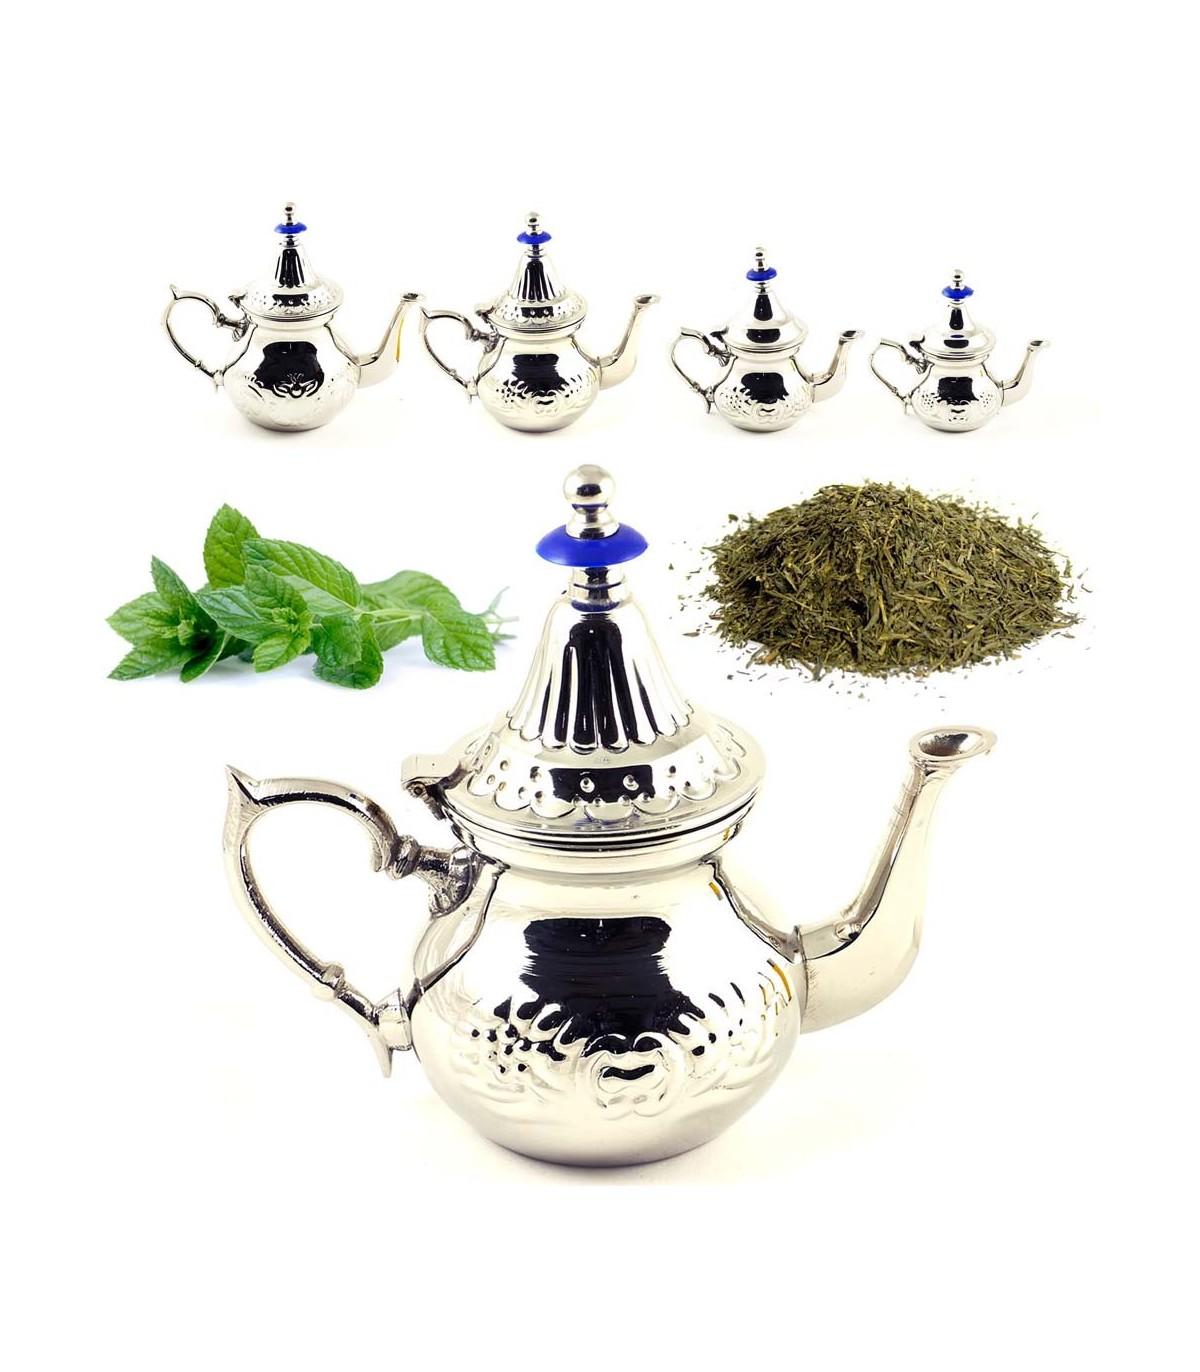 Arab Teapot INOX - Moroccan Style Teapot - Steel - Great Quality